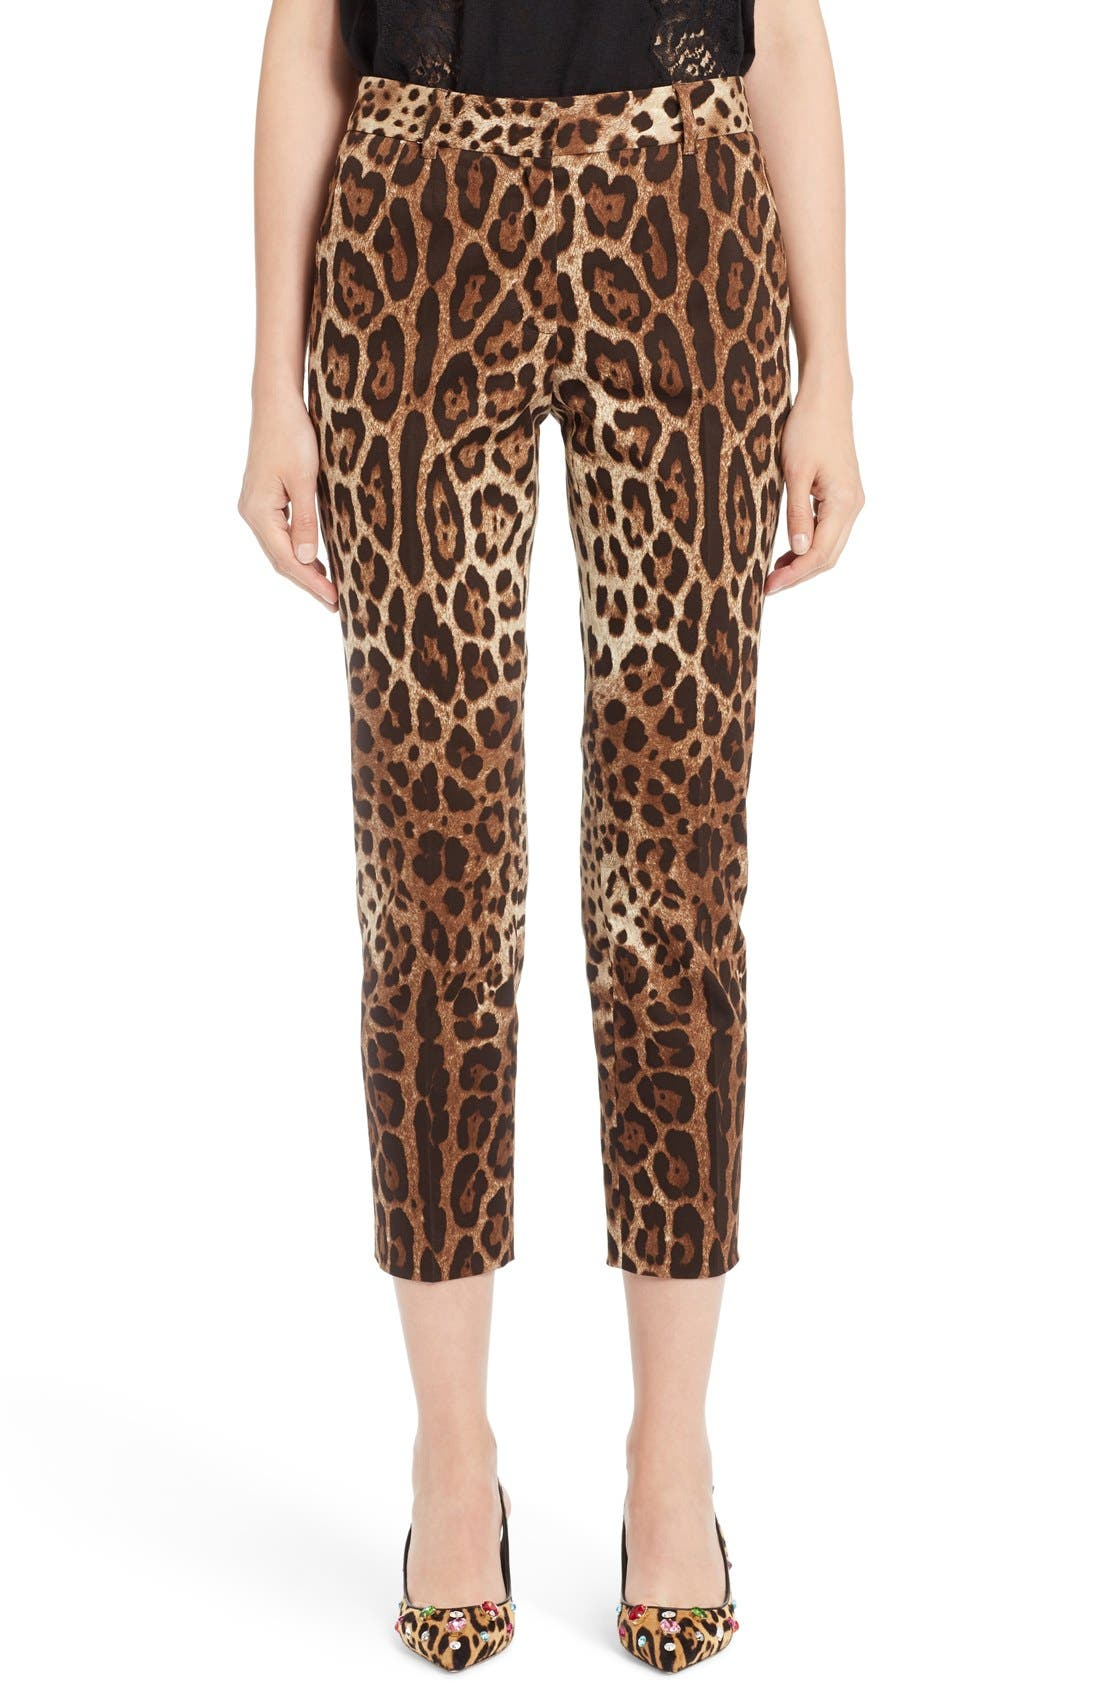 Dolce&Gabbana Leopard Print Ankle Pants